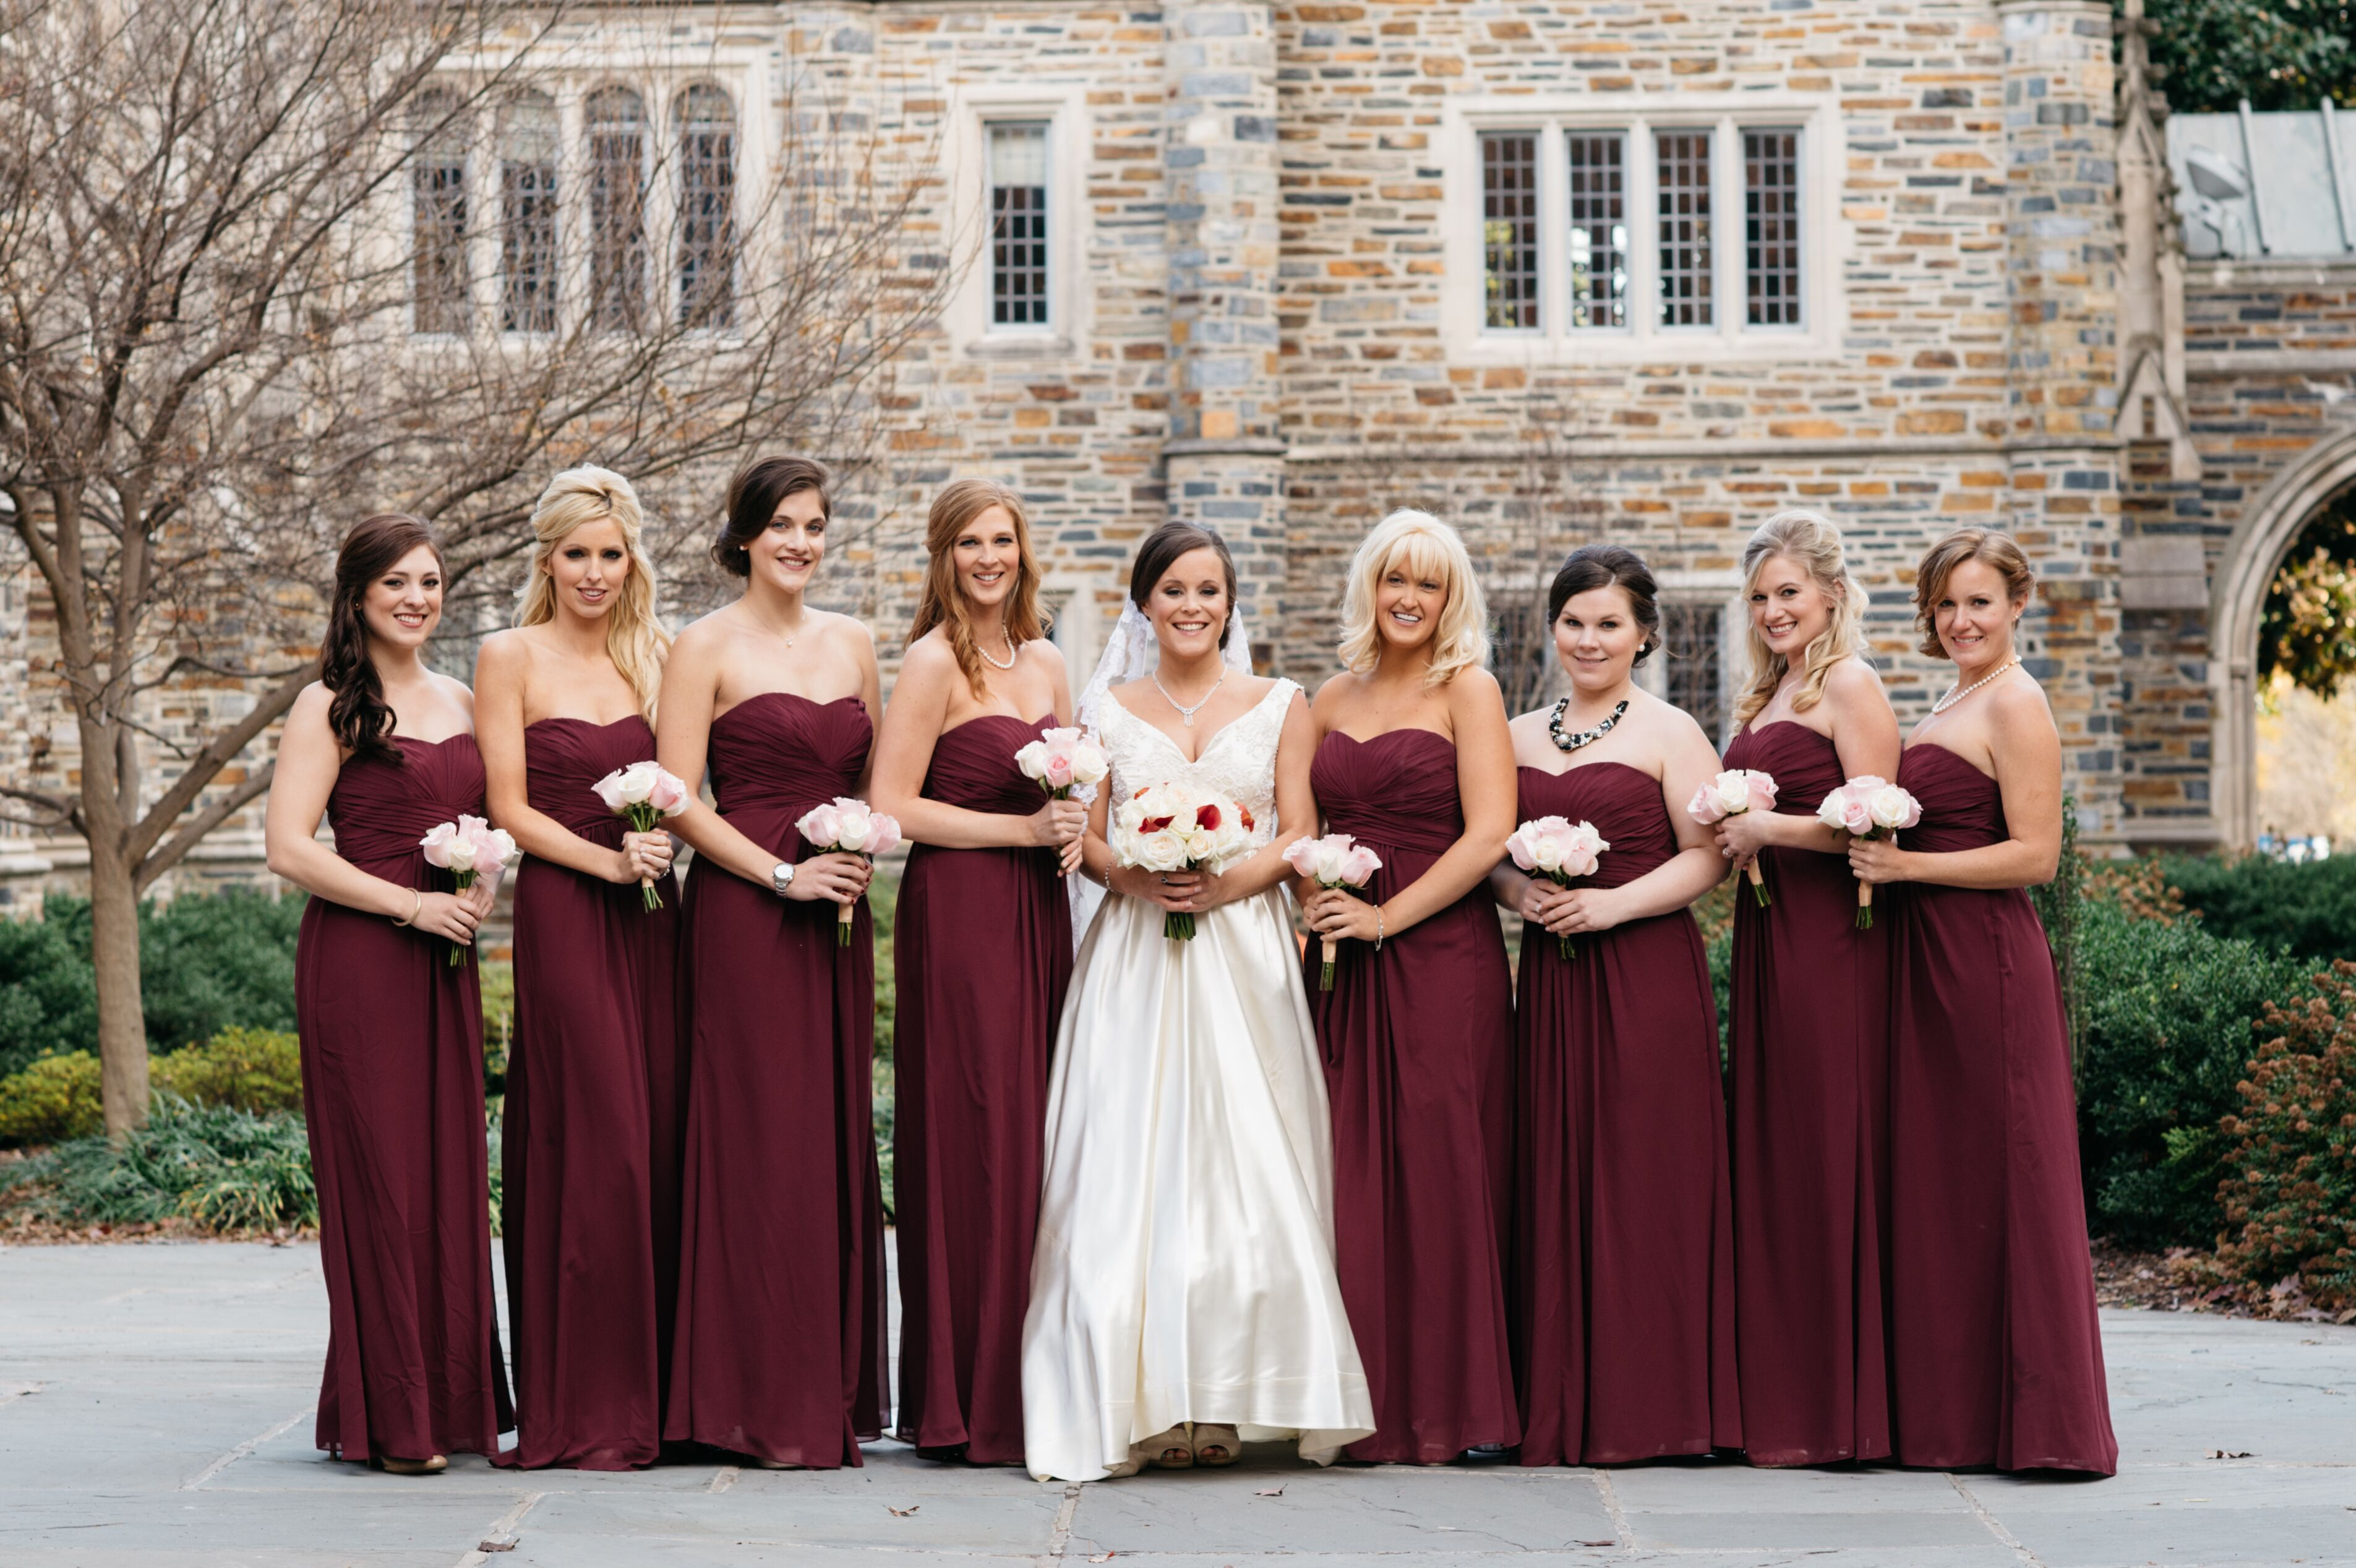 Strapless Burgundy Bridesmaid Dresses